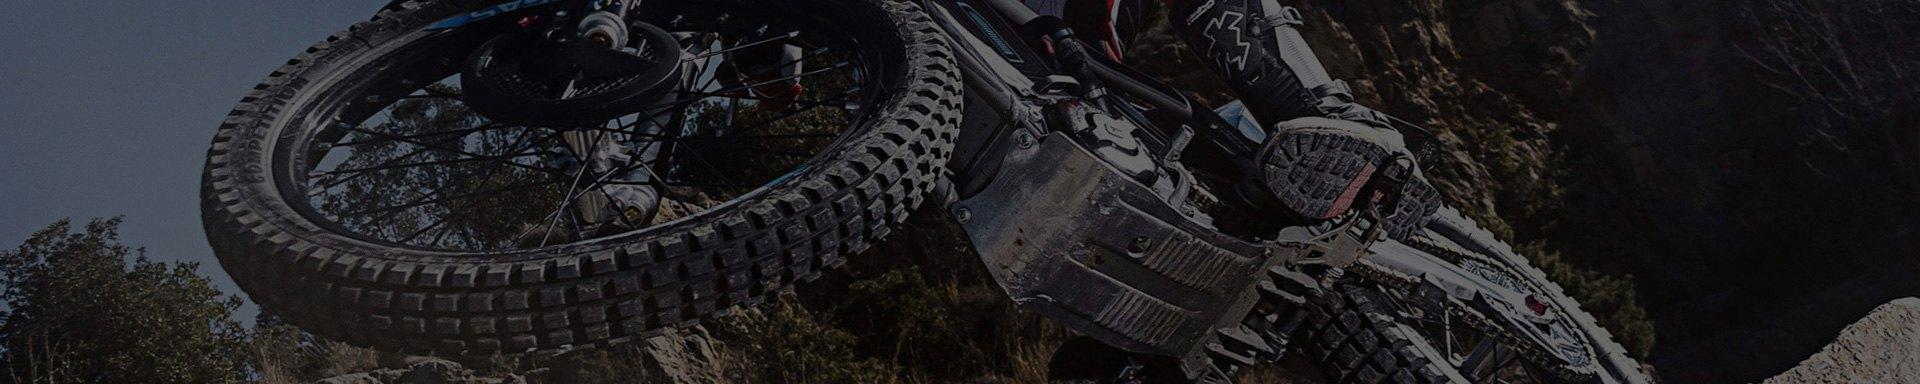 8e6f518789d Motorcycle Parts & Accessories   Sport Bike, Cruiser, Dirt Bike -  MOTORCYCLEiD.com